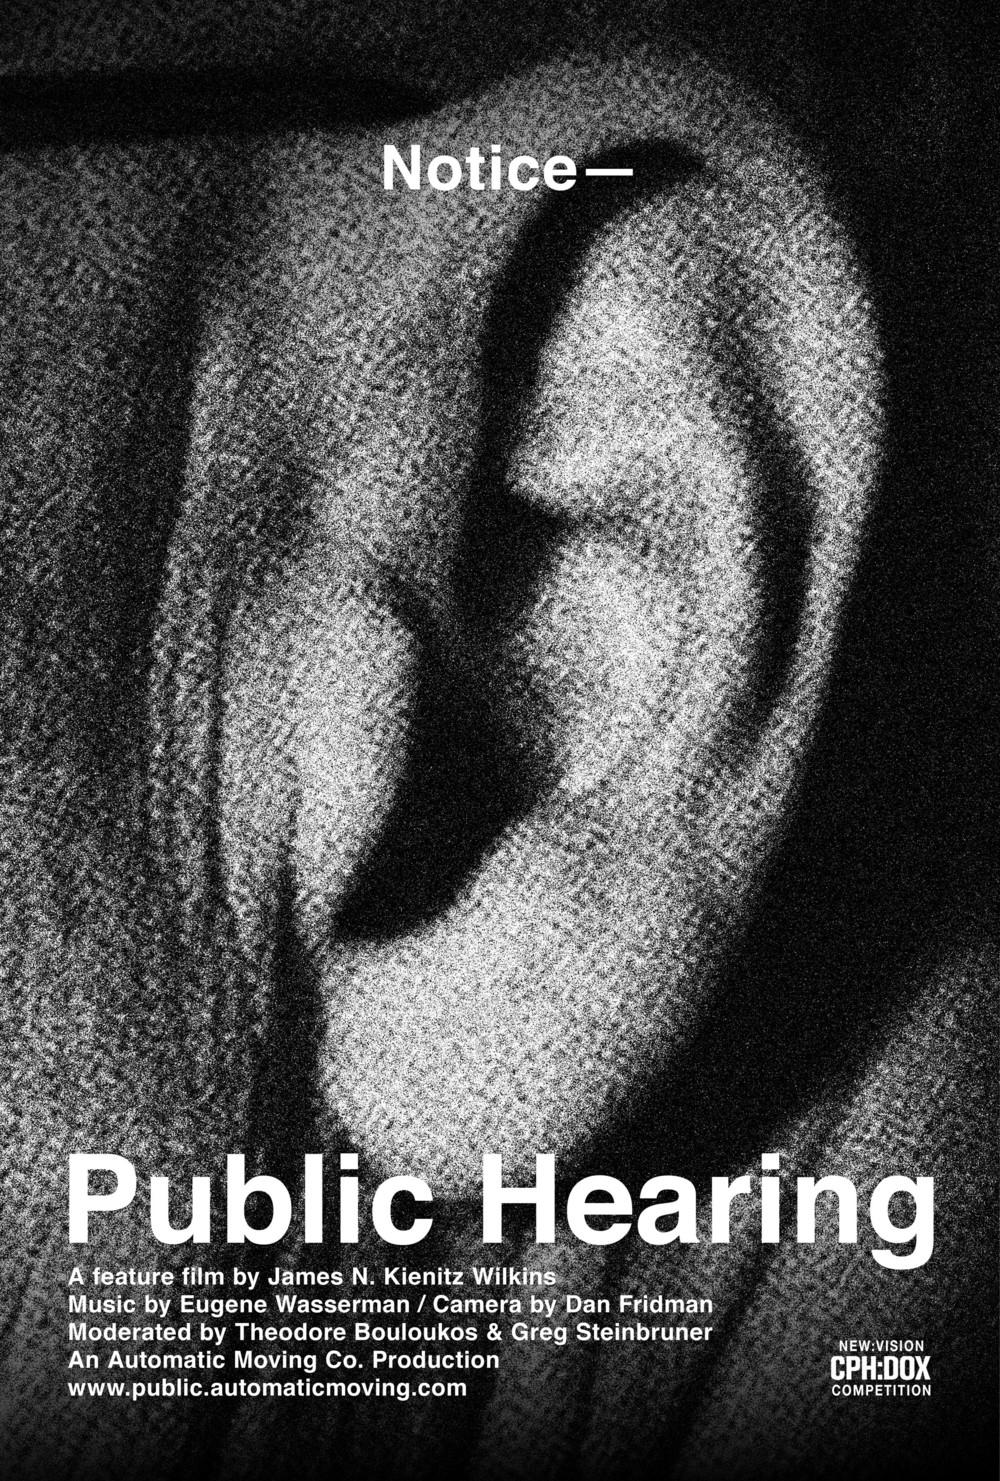 Public_Hearing-film_poster-LRG.jpg